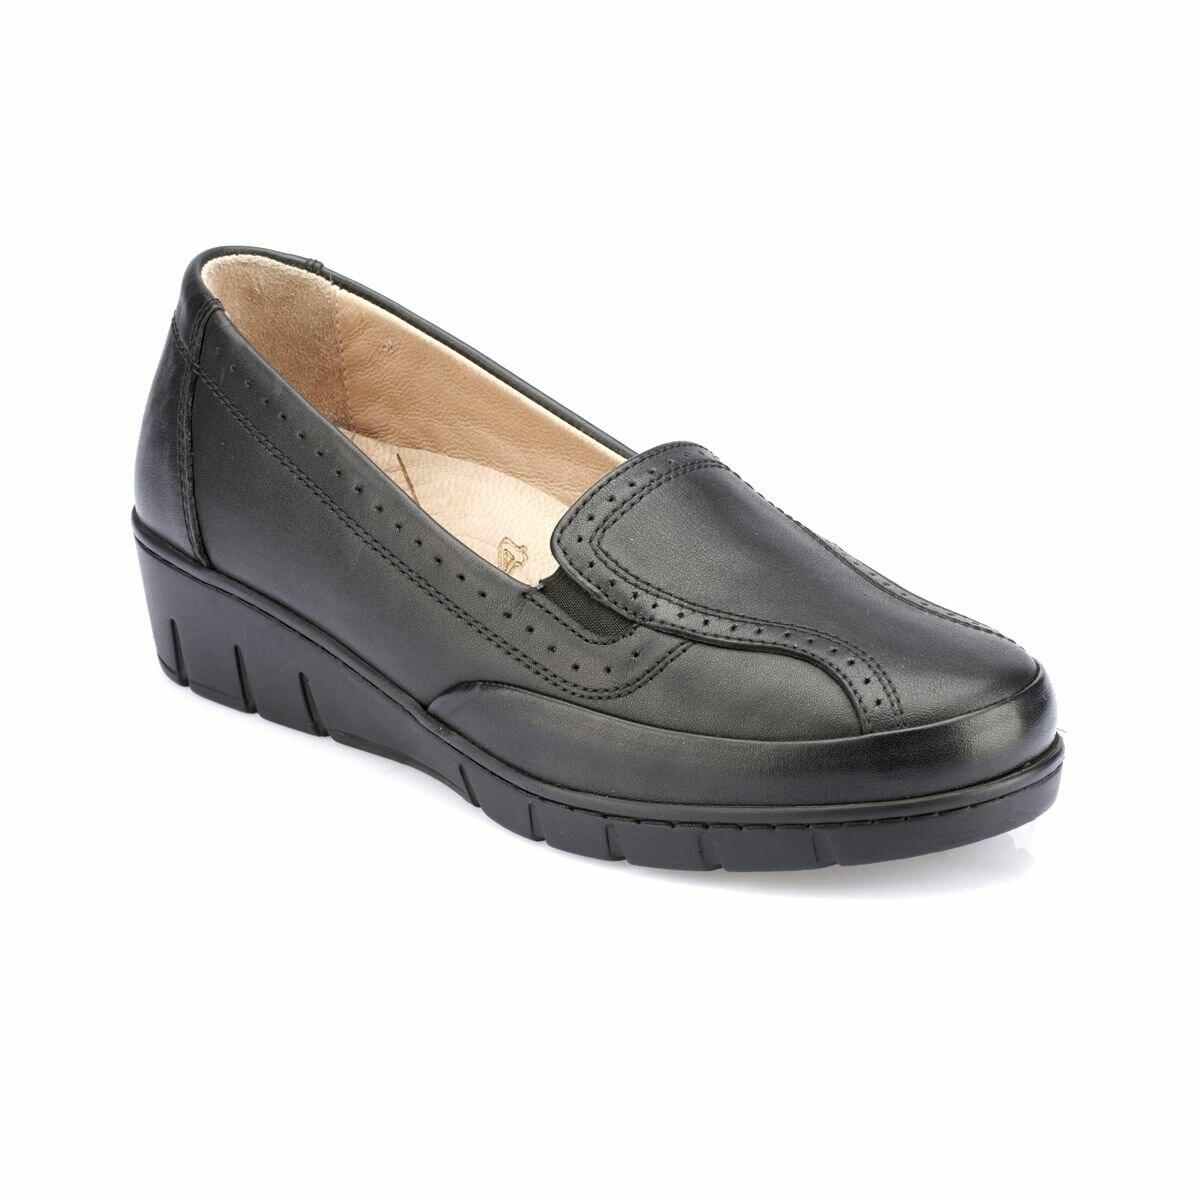 FLO 82. 110002.Z Black Women Shoes Polaris 5 Point